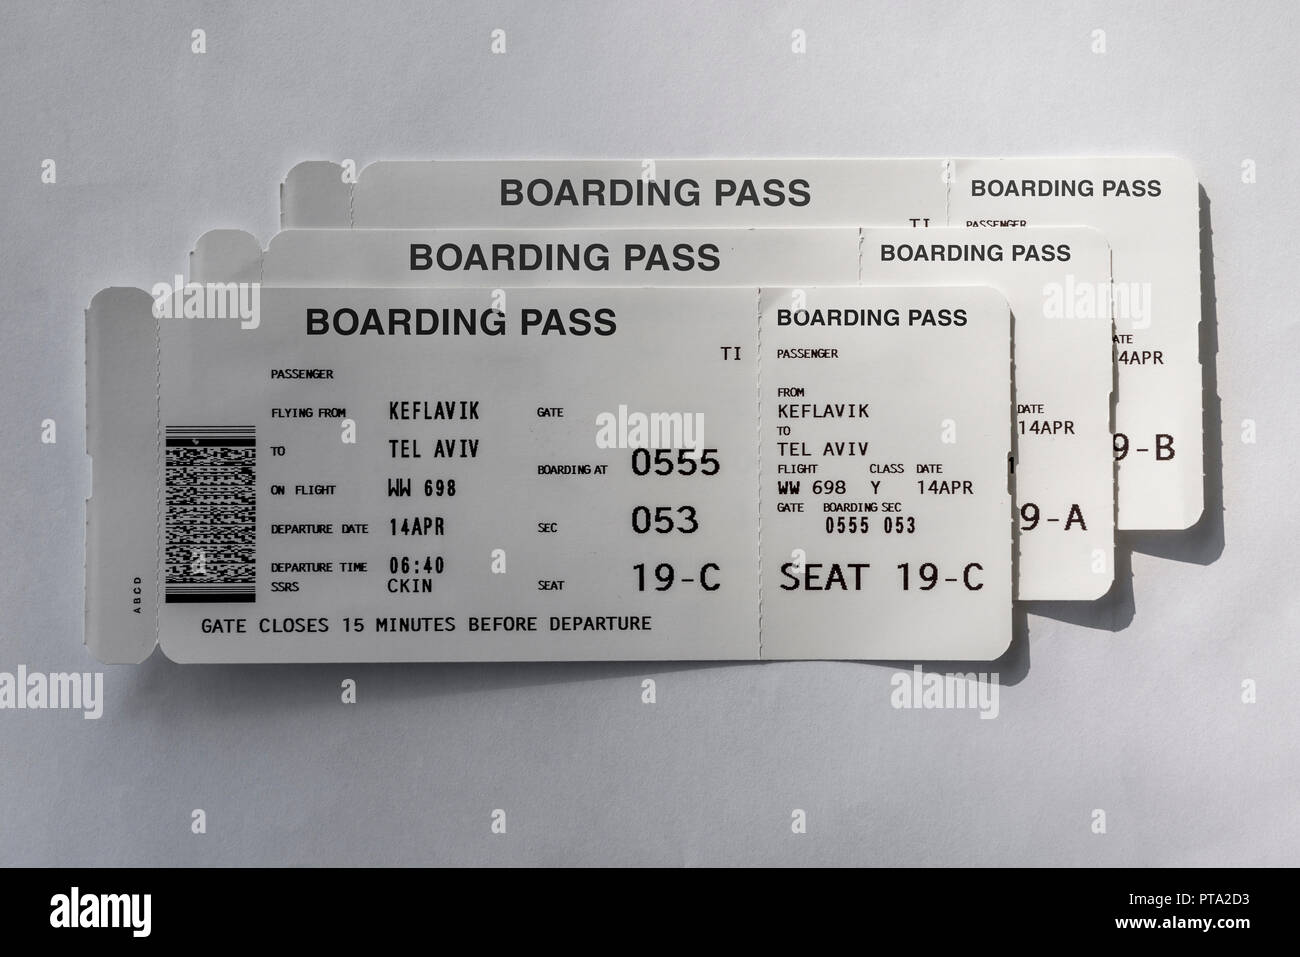 e89cf3c6018 Airline Boarding Pass Stock Photos   Airline Boarding Pass Stock ...